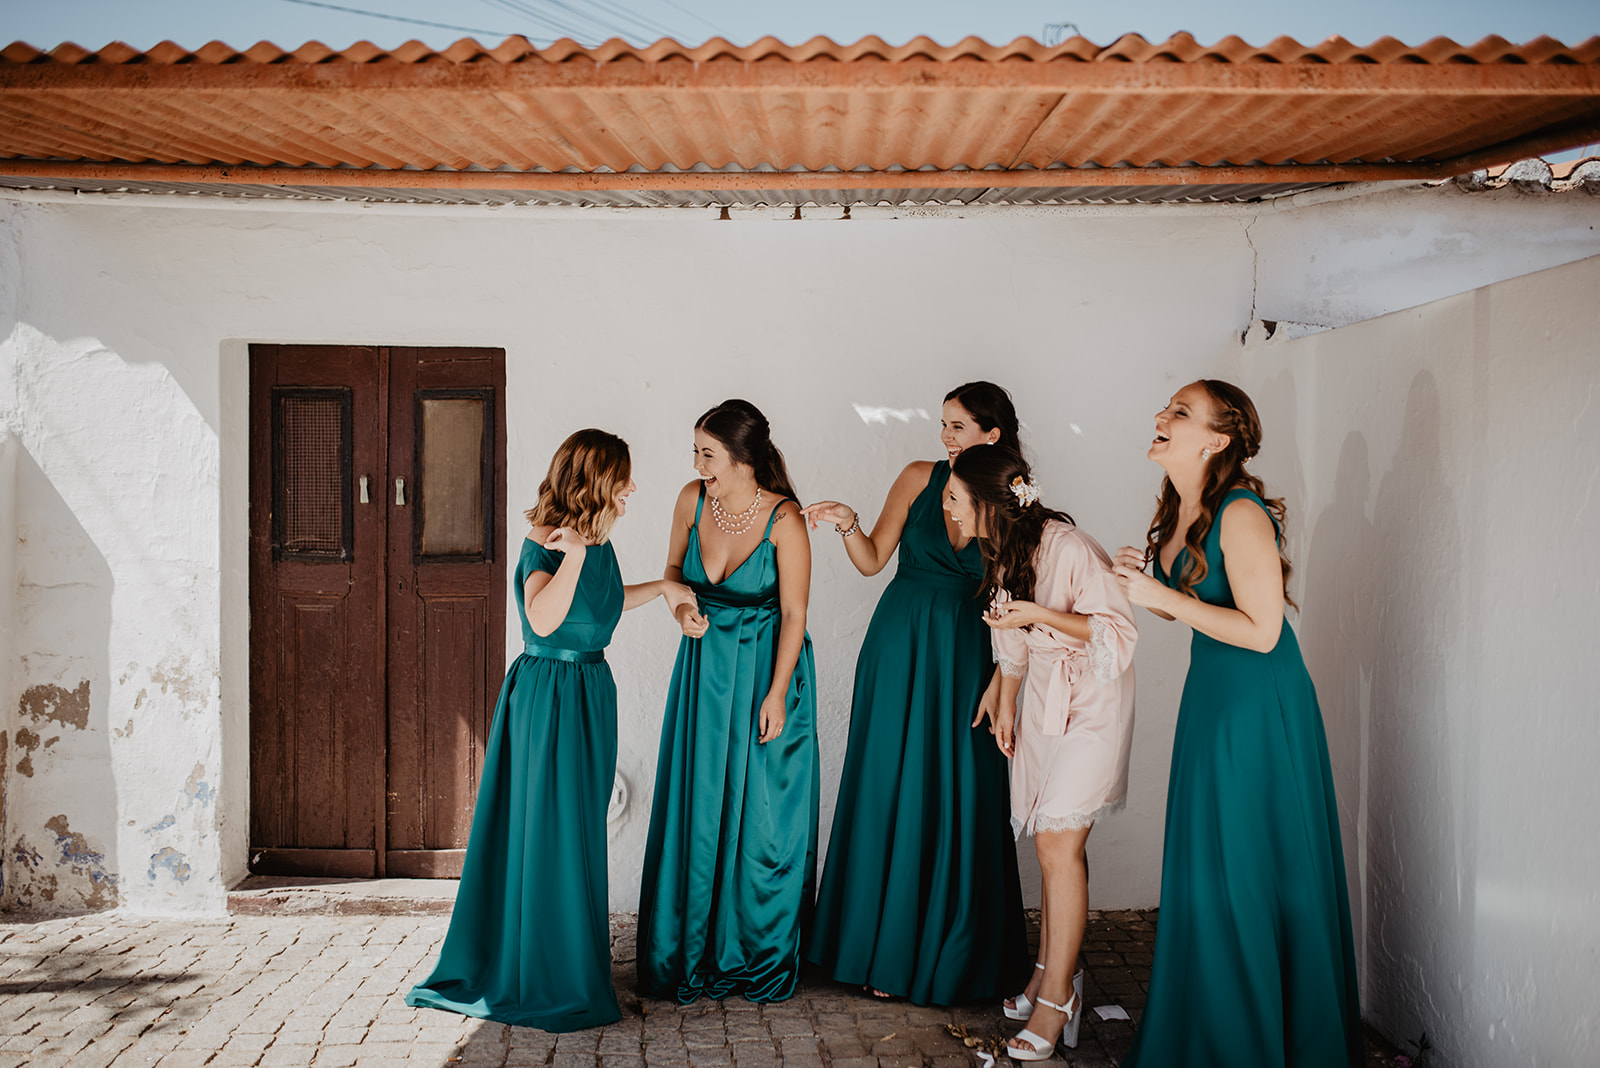 Lapela-photography-wedding-algarve-portugal-best-of-131.jpg